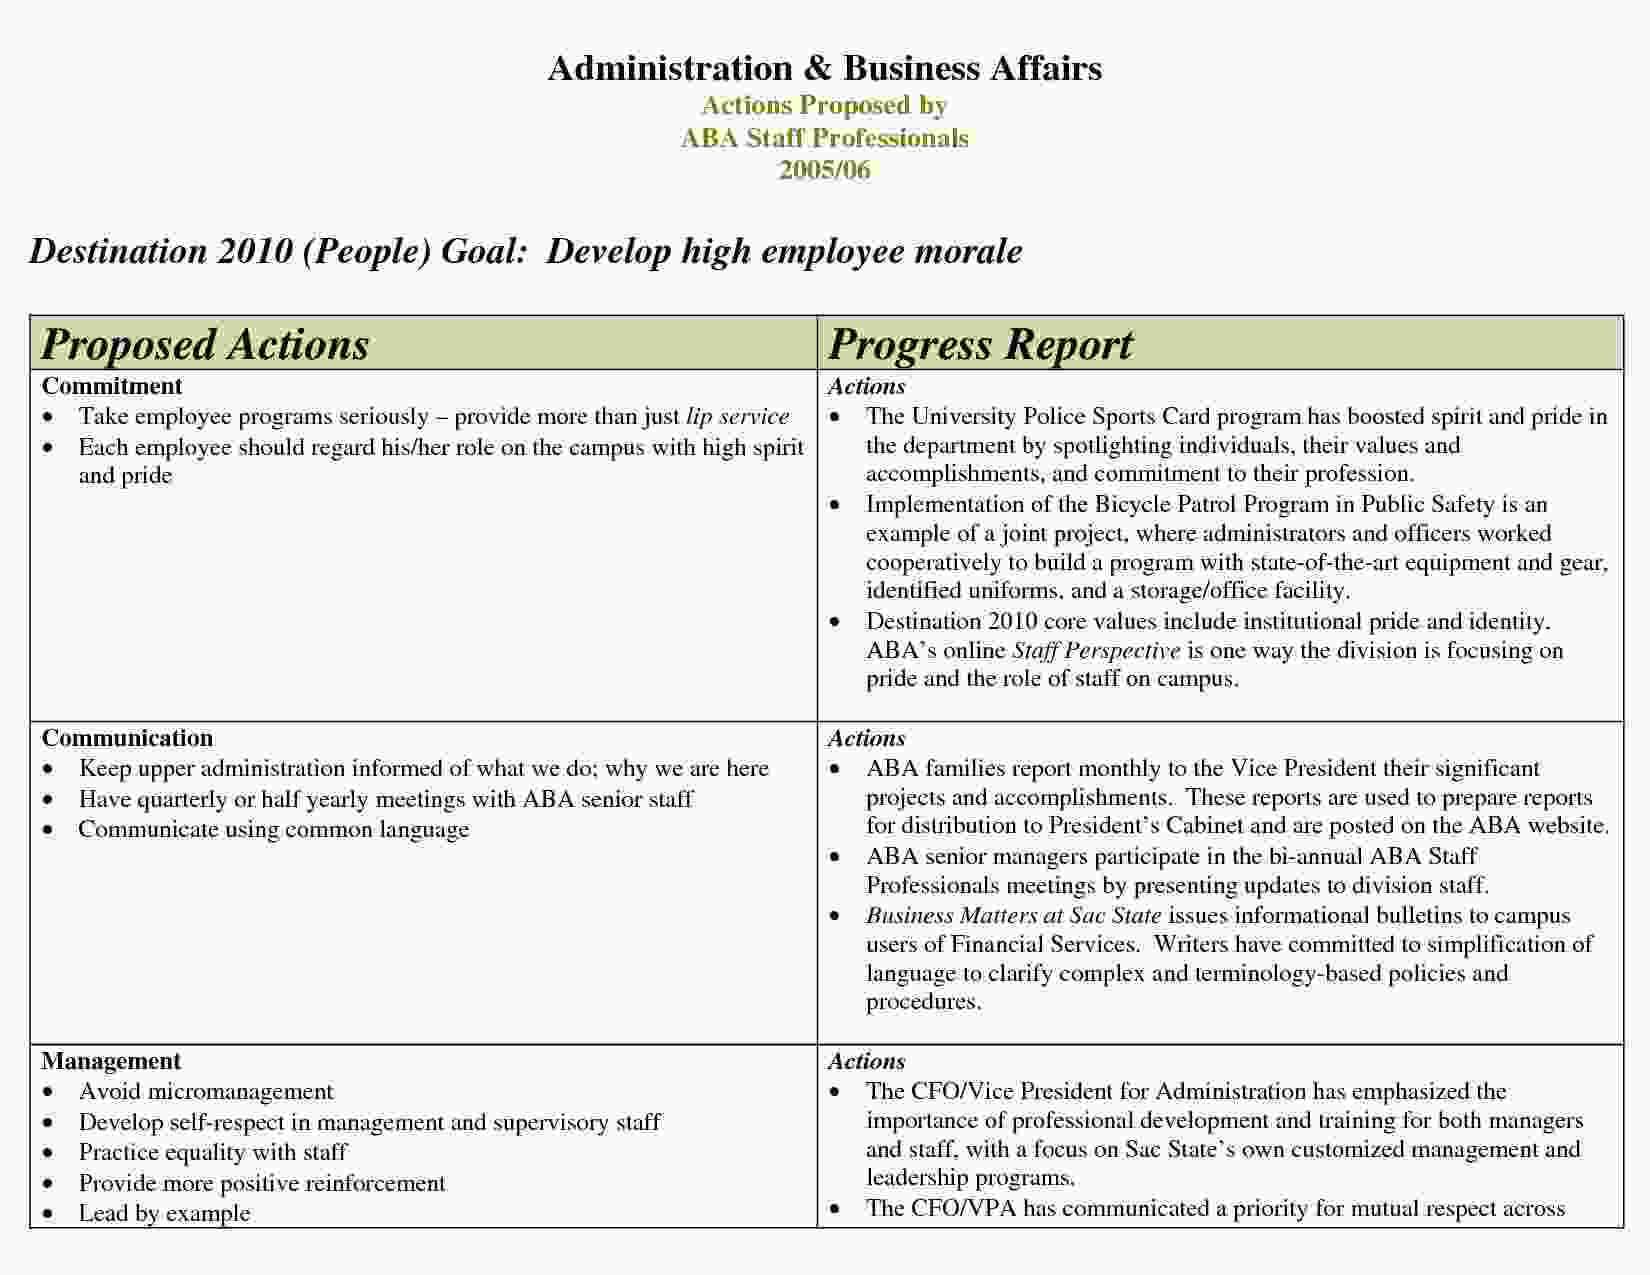 Staff Progress Report Template Cumedorg Cumedorg With Regard To Staff Progress Report Template